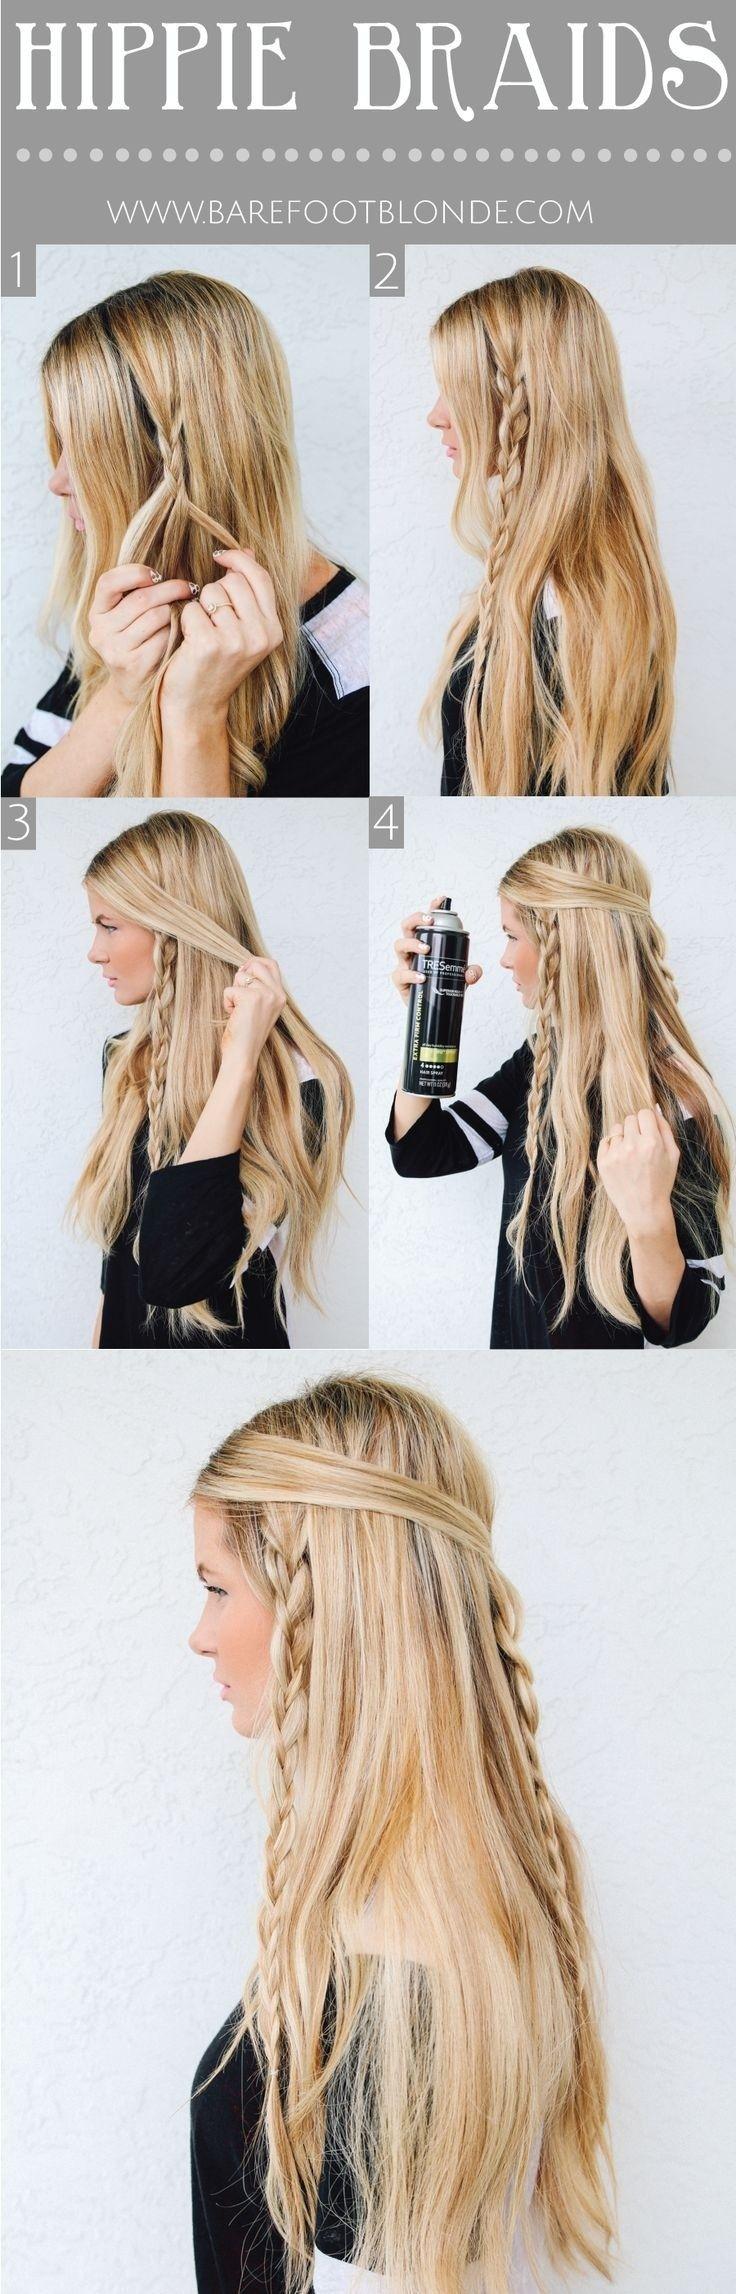 best braid for long hair hippie braids easy braided hairstyles